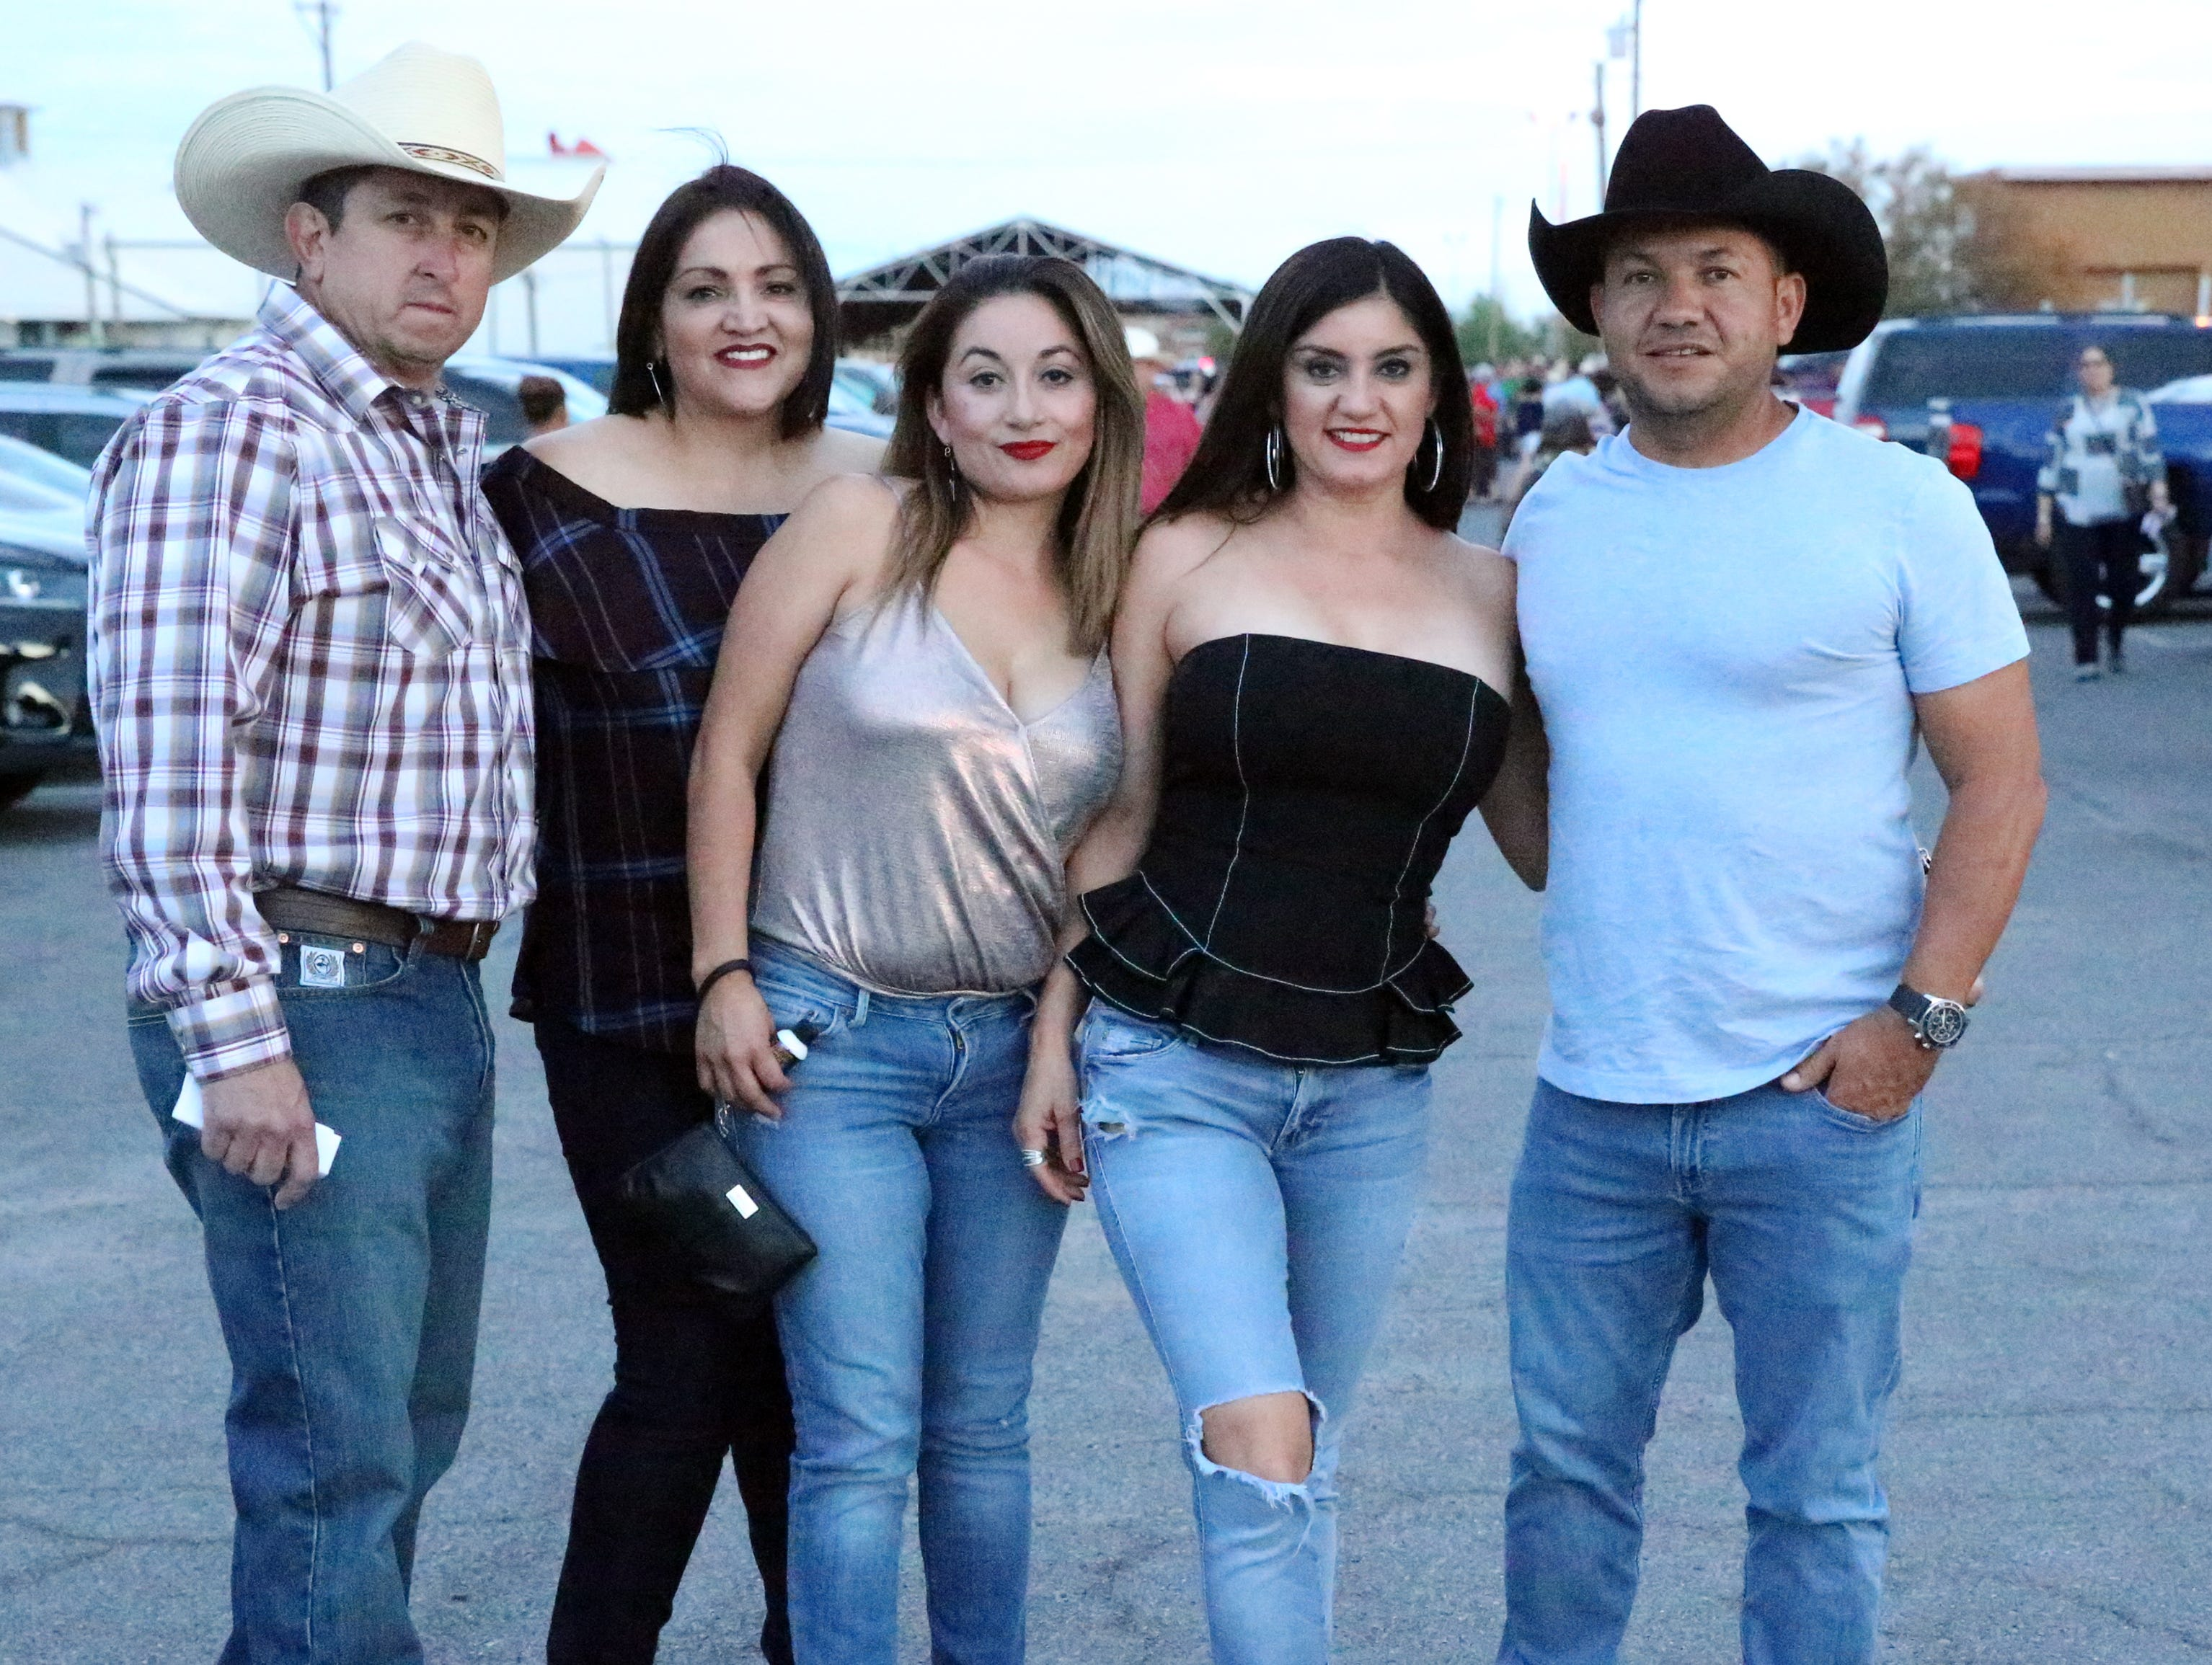 Rick Montes, Rosa Montes, Nancy Aguilar, Juanita Garcia and Charlie Garcia.